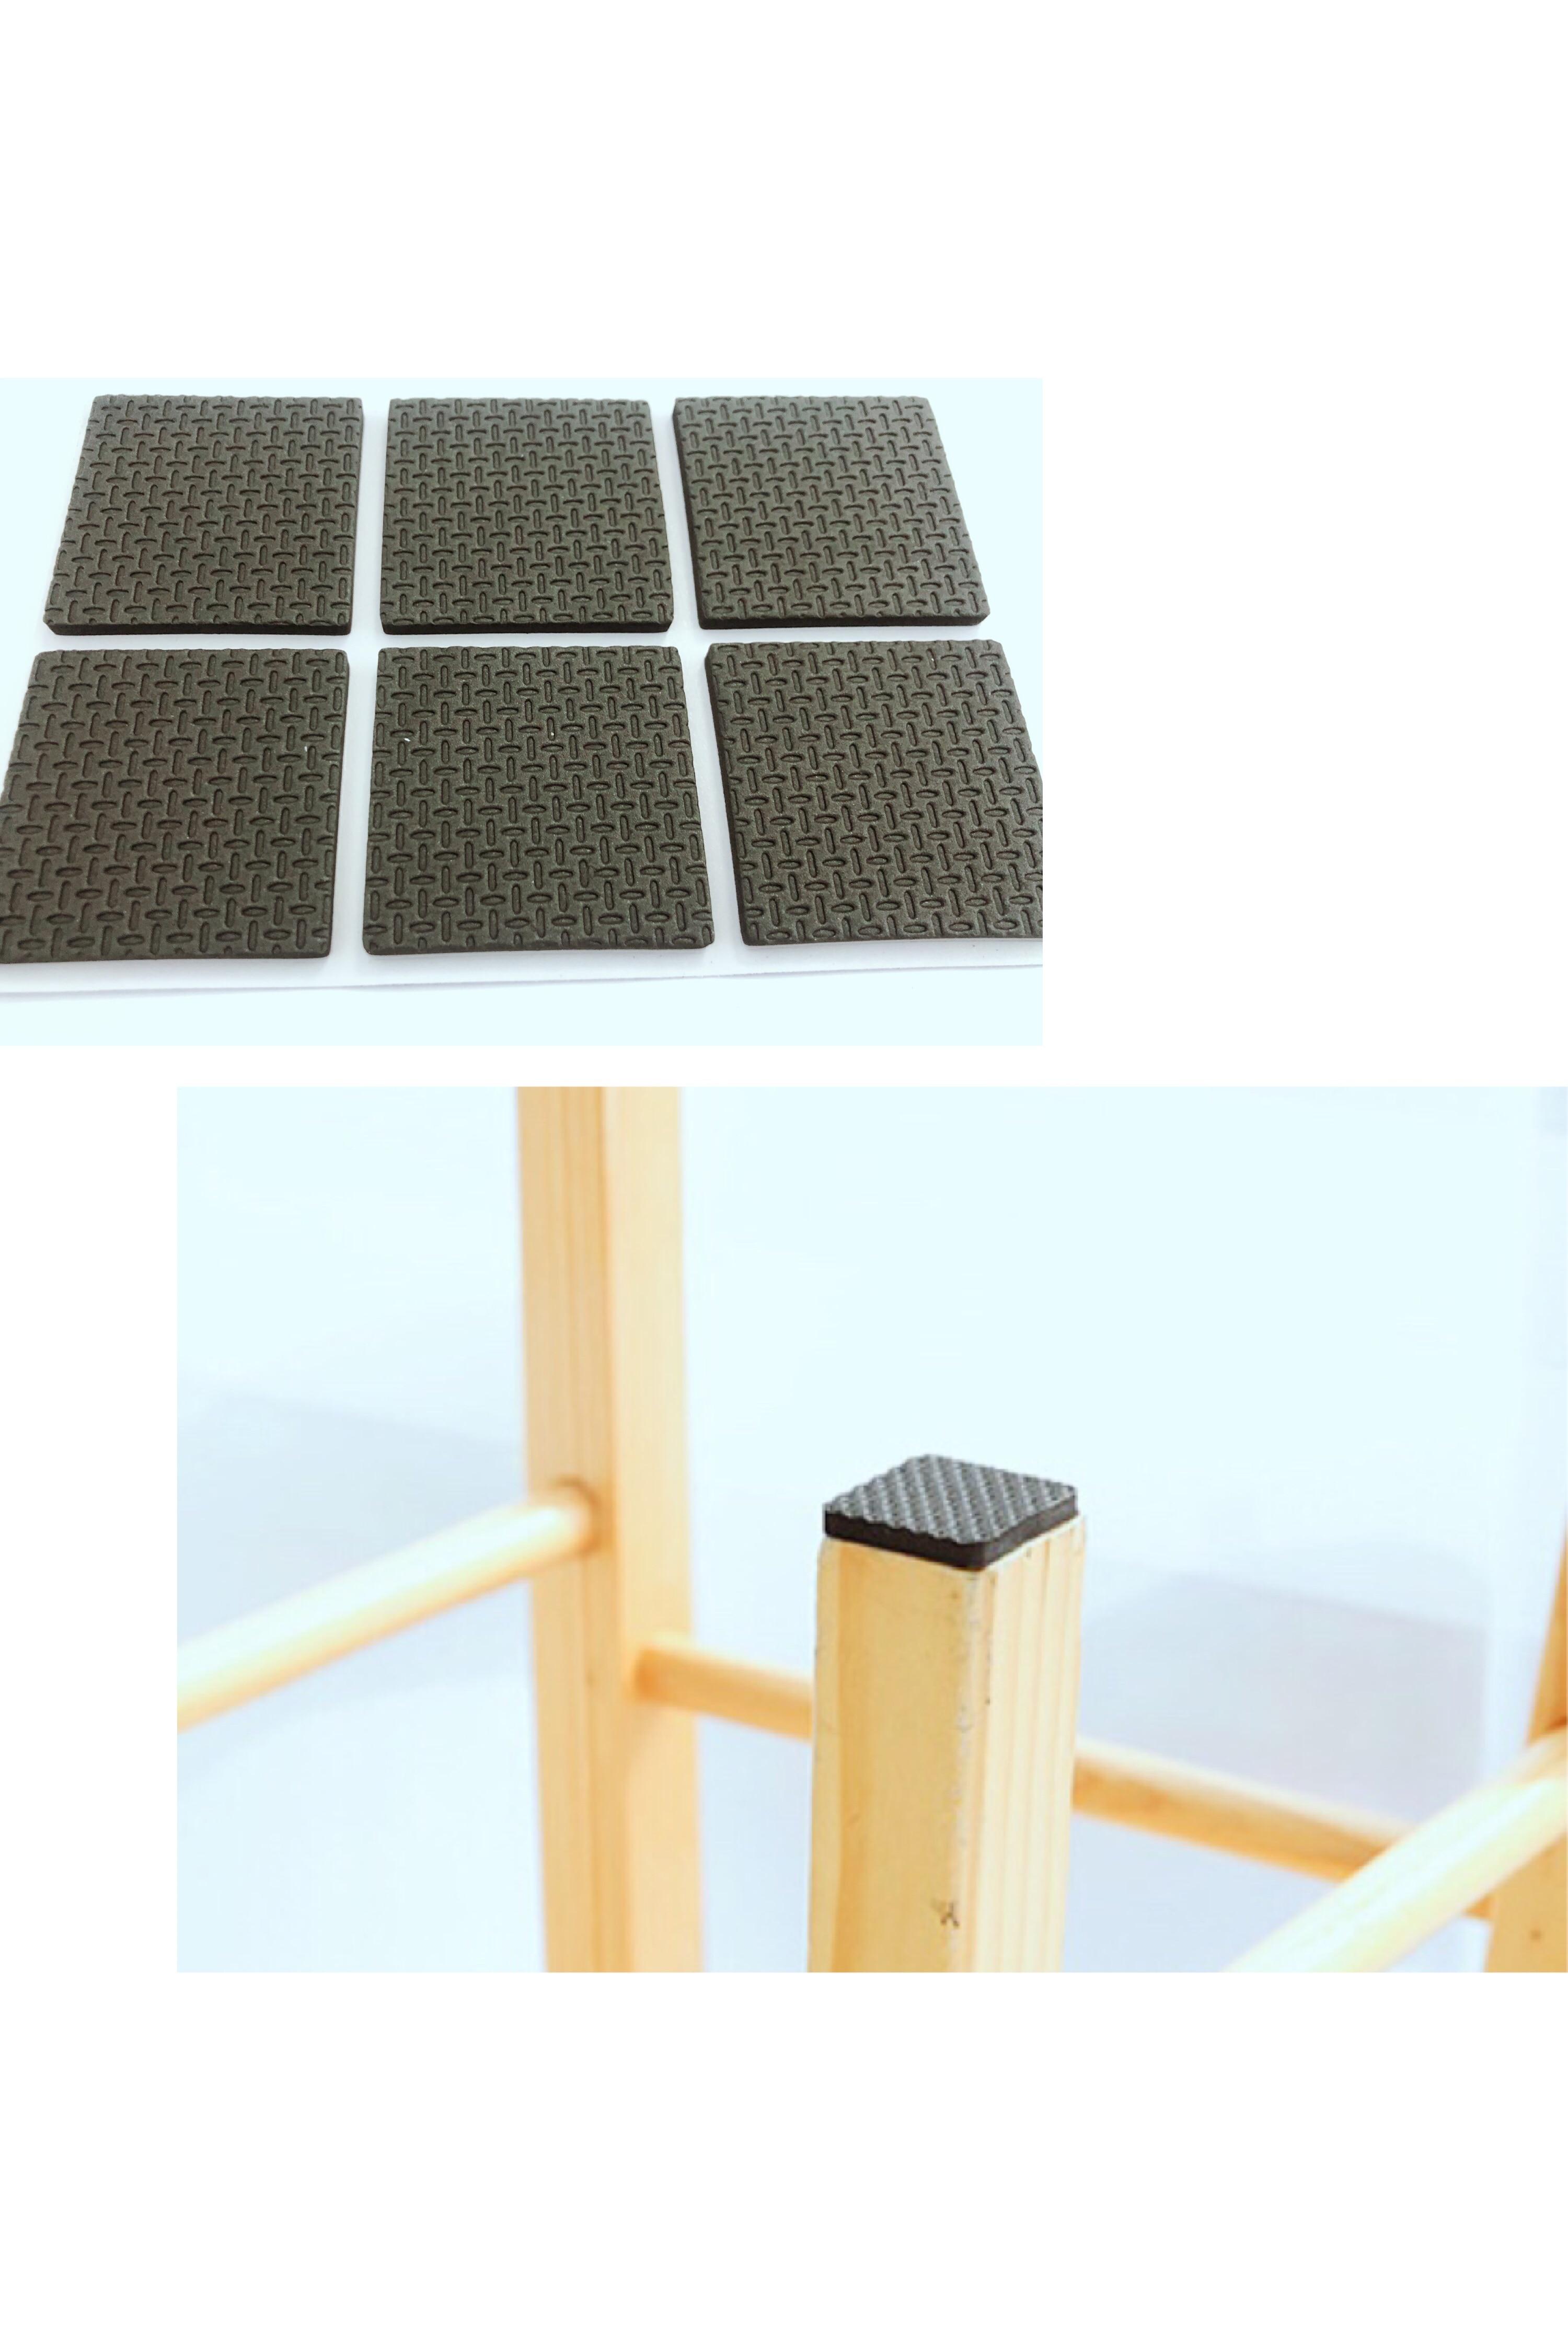 6PCS 12PCS Square Circle Self Adhesive Furniture Leg Feet Non Slip Rug Felt Pads Anti Slip Mat Soft Close Protect Tool Parts